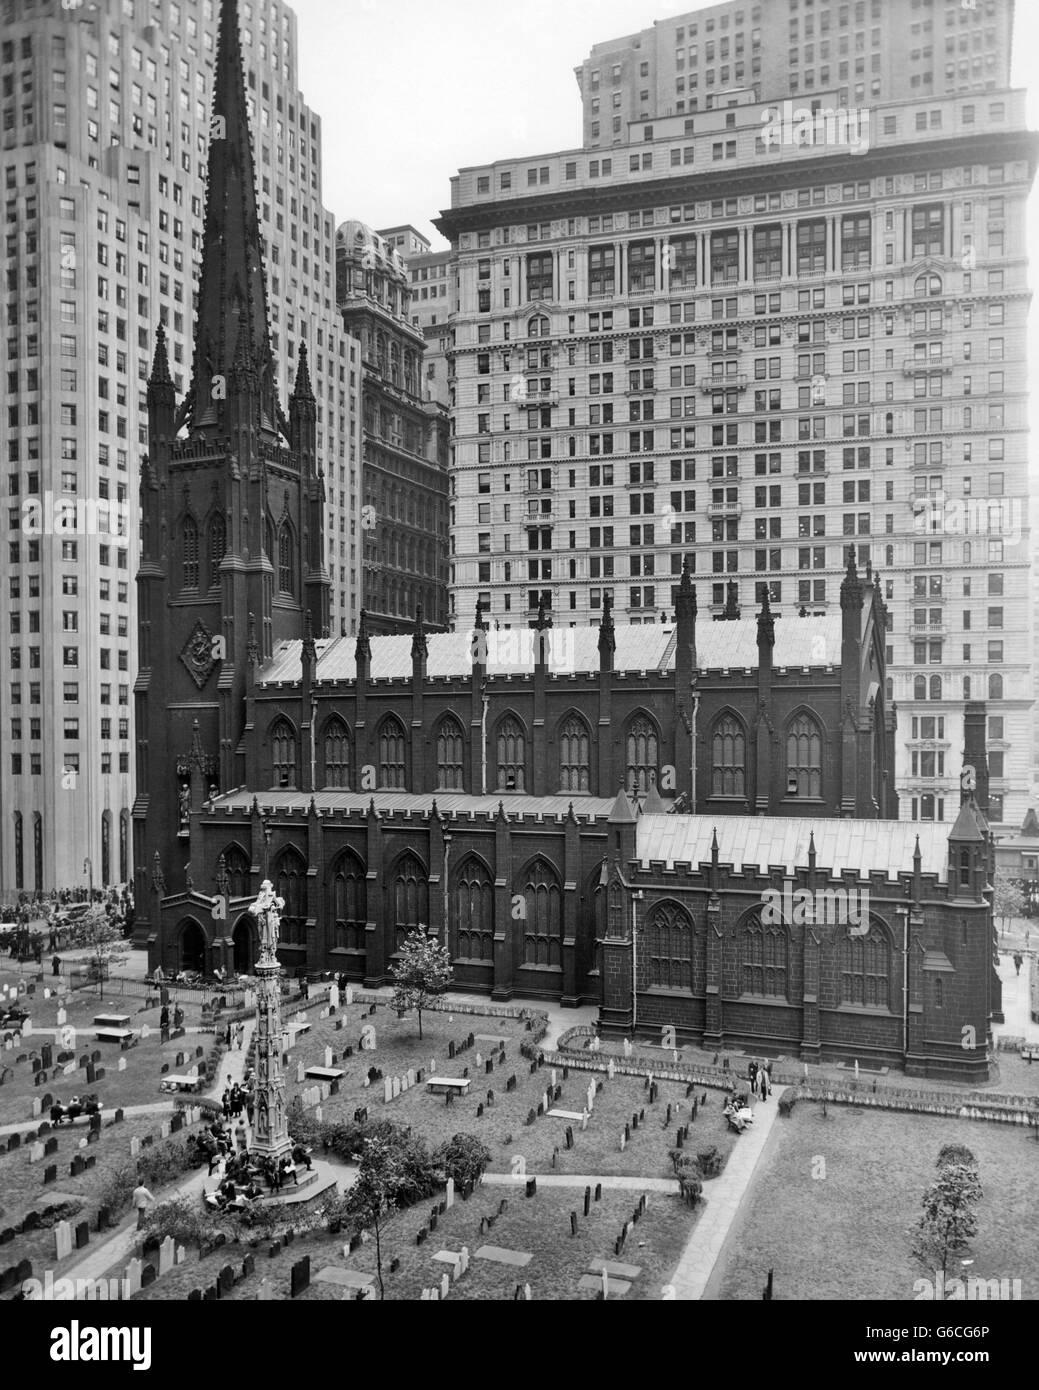 1950s LOOKING DOWN ON TRINITY CHURCH YARD AND CEMETERY DOWNTOWN MANHATTAN NEW YORK CITY NEAR WALL STREET NYC NY - Stock Image